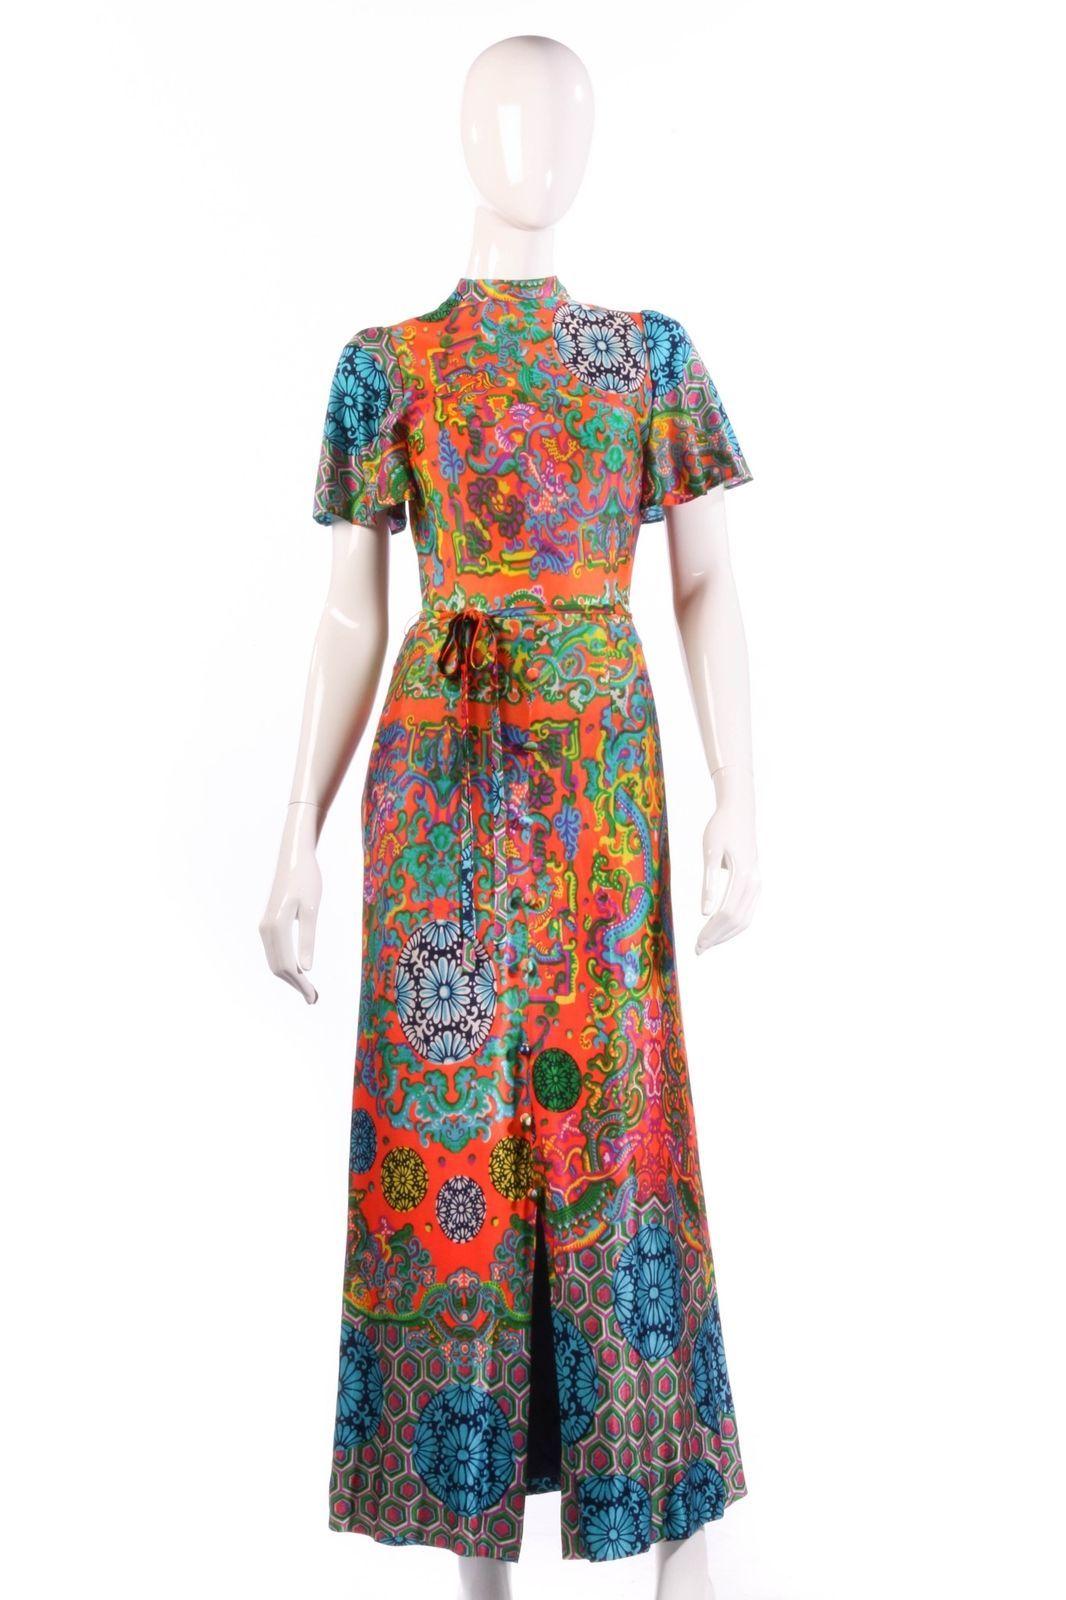 Leygil Multi Coloured Floral Vintage Maxi Dress Size 6 8 Vintage Maxi Dress Summer Maxi Dress Floral Maxi Dress Size 16 [ 1600 x 1066 Pixel ]